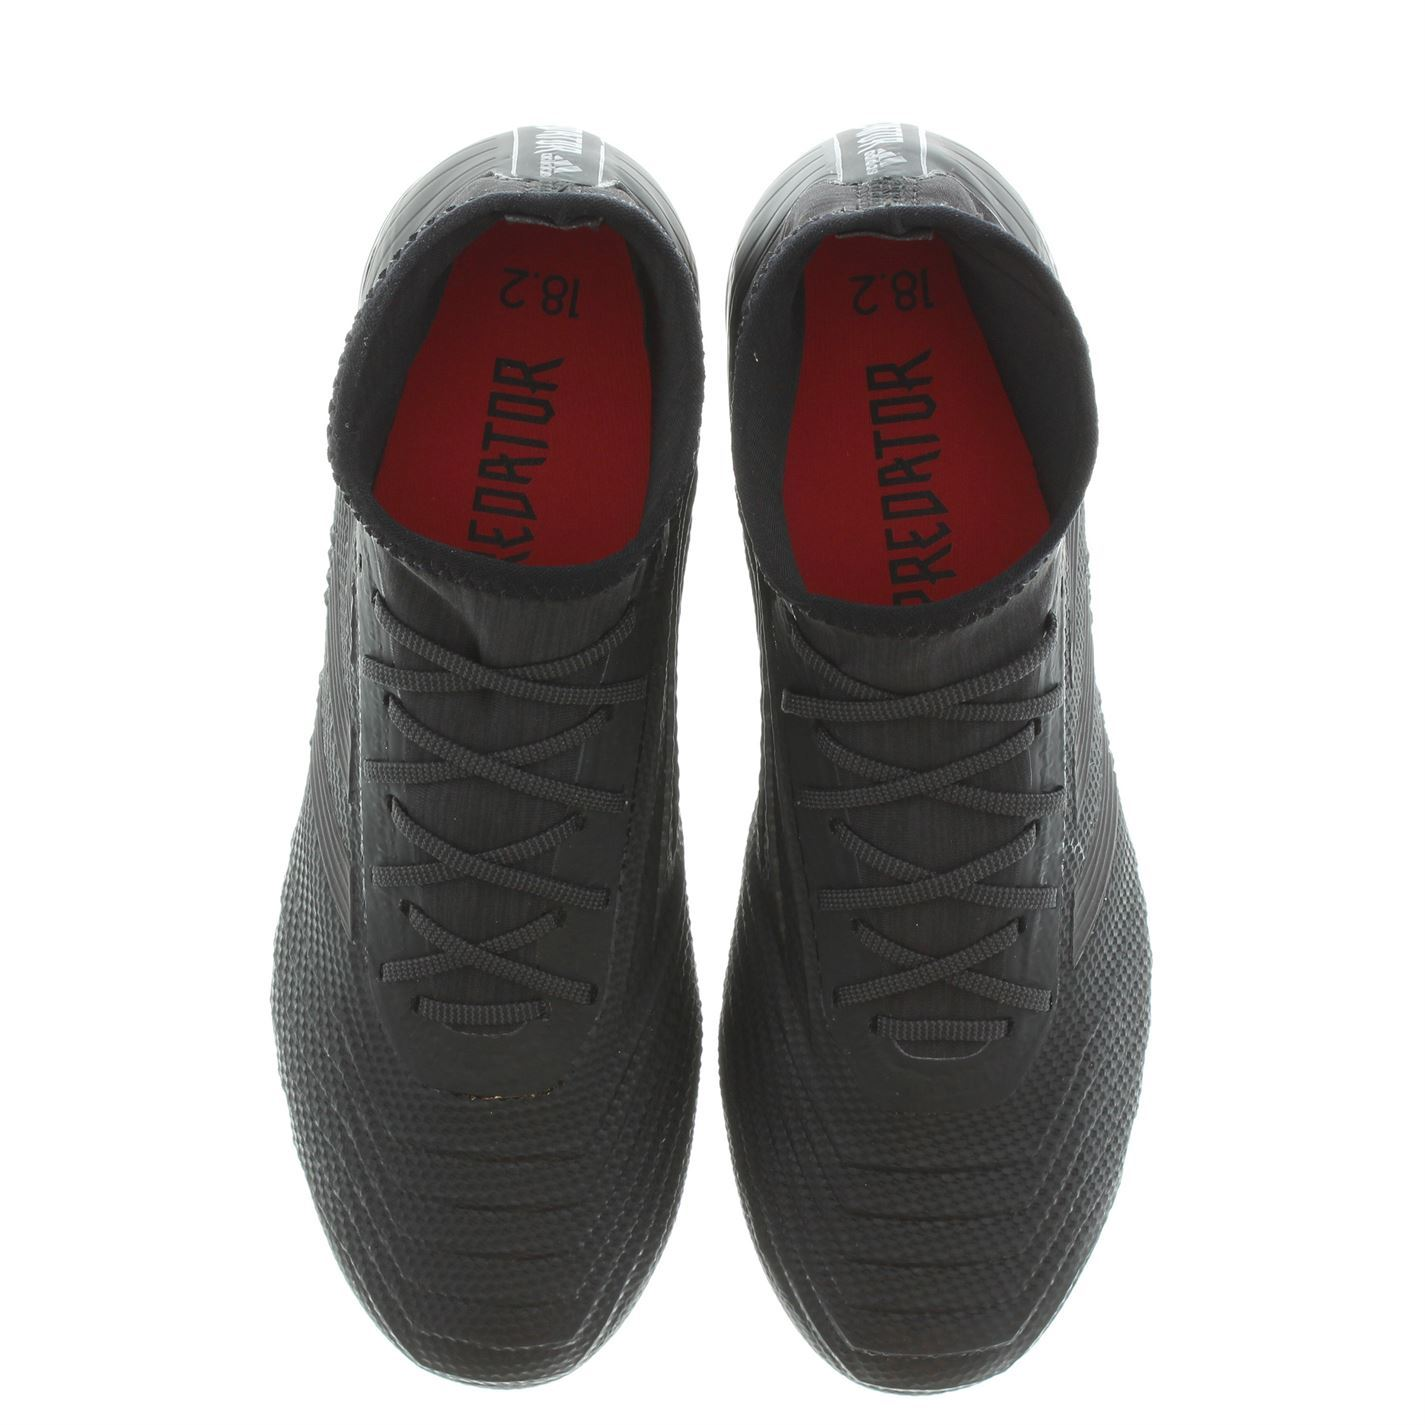 d13def68b3a ... adidas Predator 18.2 FG Firm Ground Football Boots Black Mens Soccer  Shoe Cleats